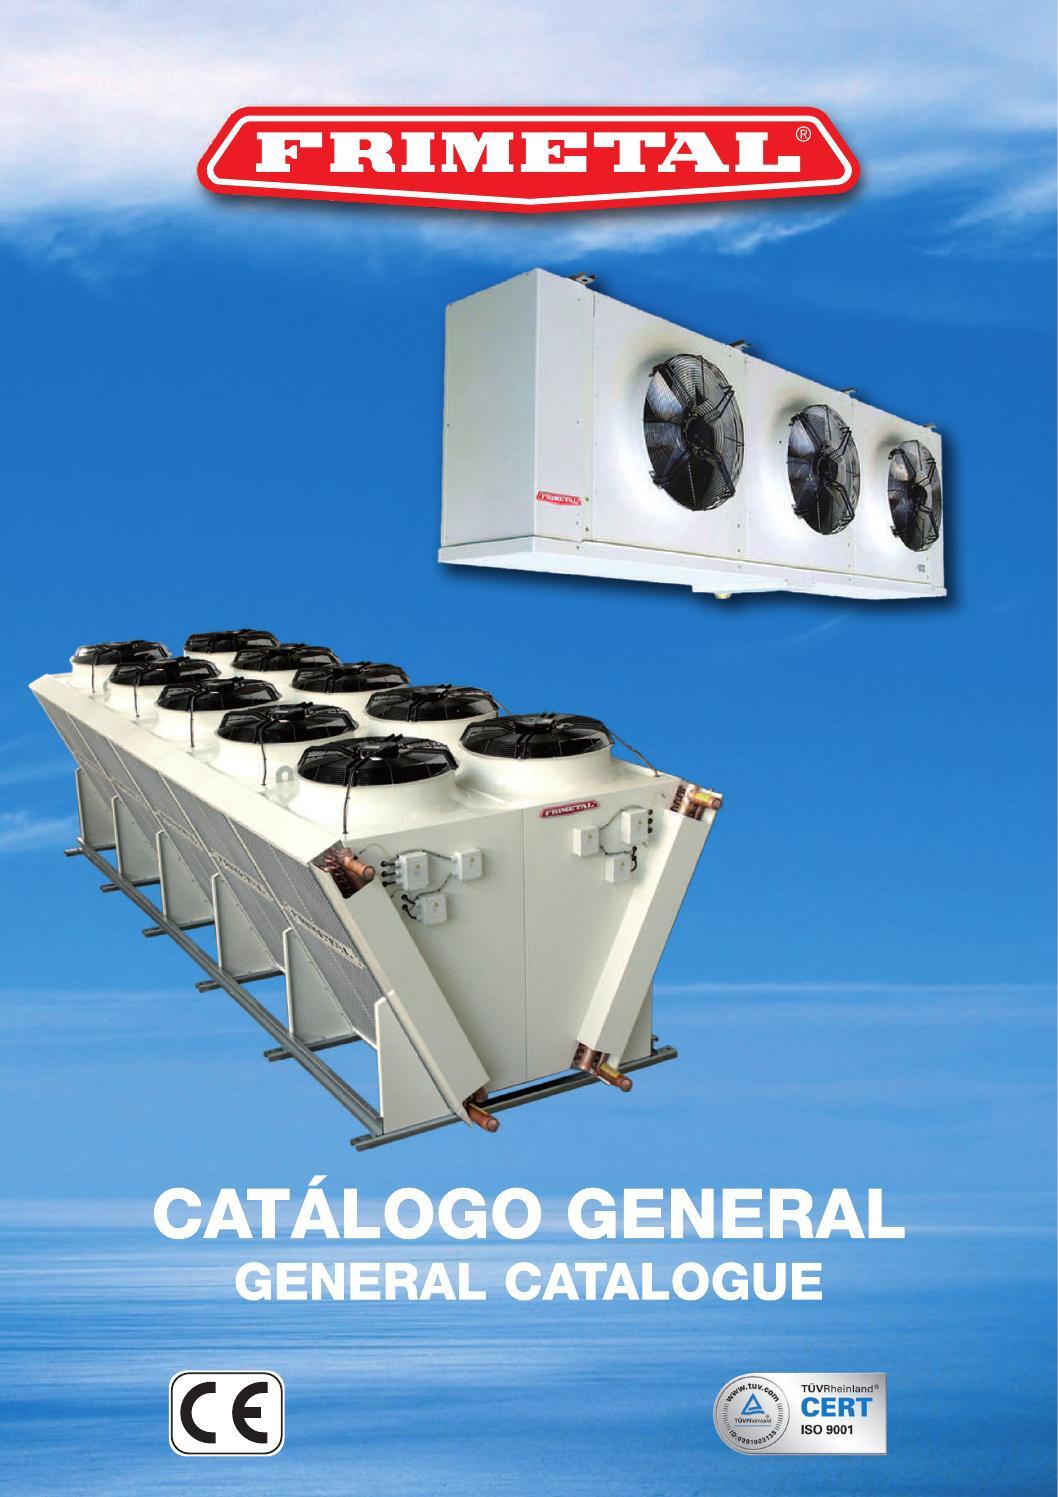 Catalogo general 2013 media by frimetal evaporadores - issuu on